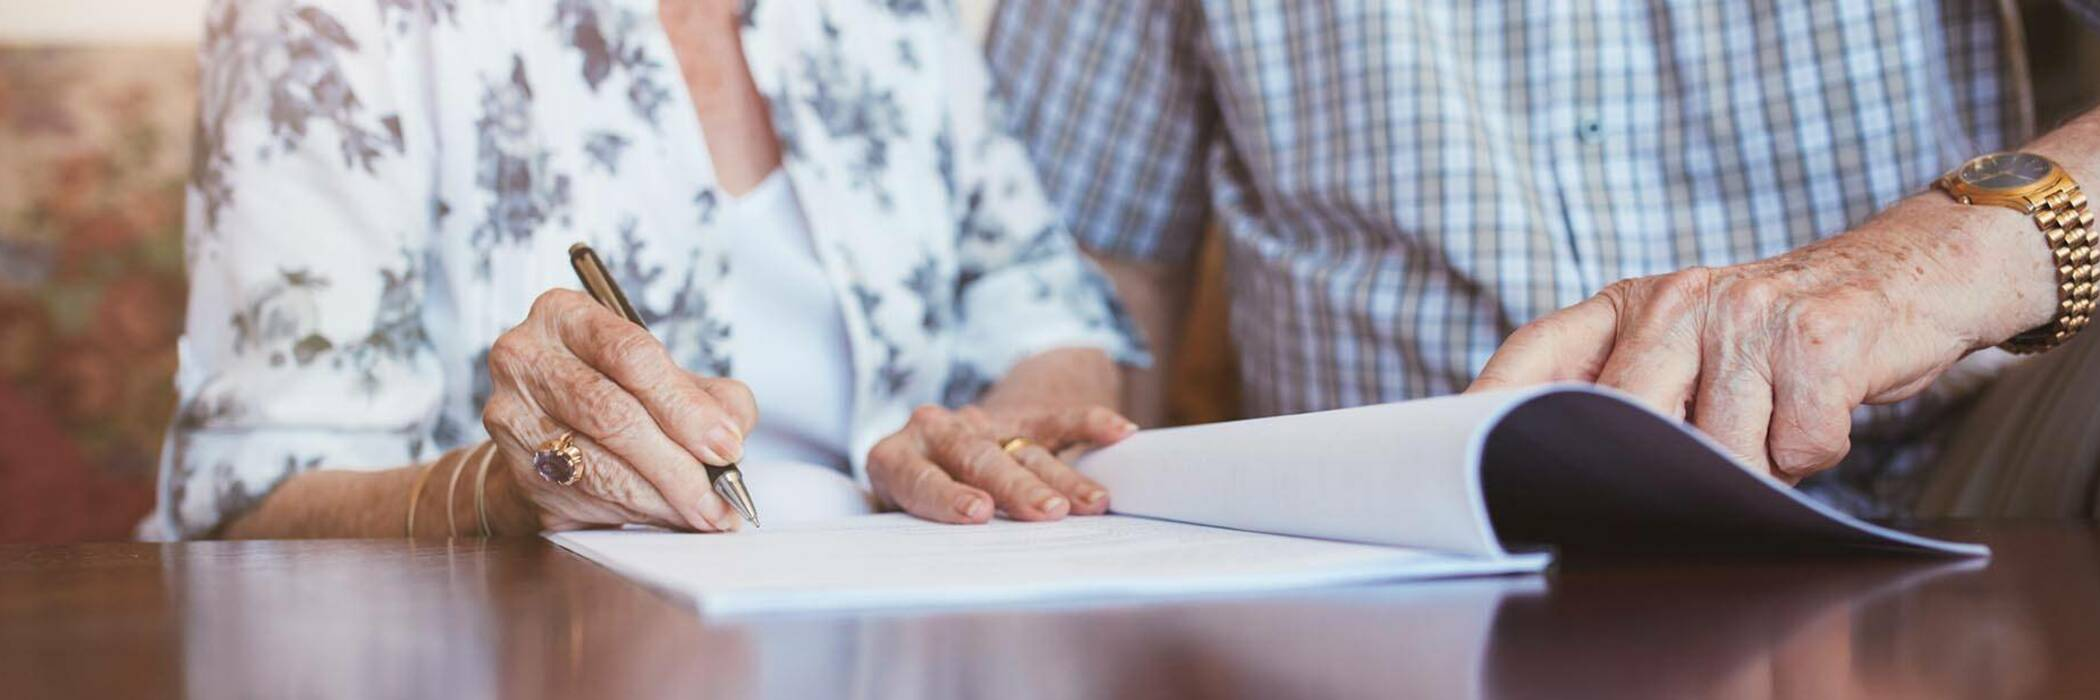 19aug retirement village contracts hero